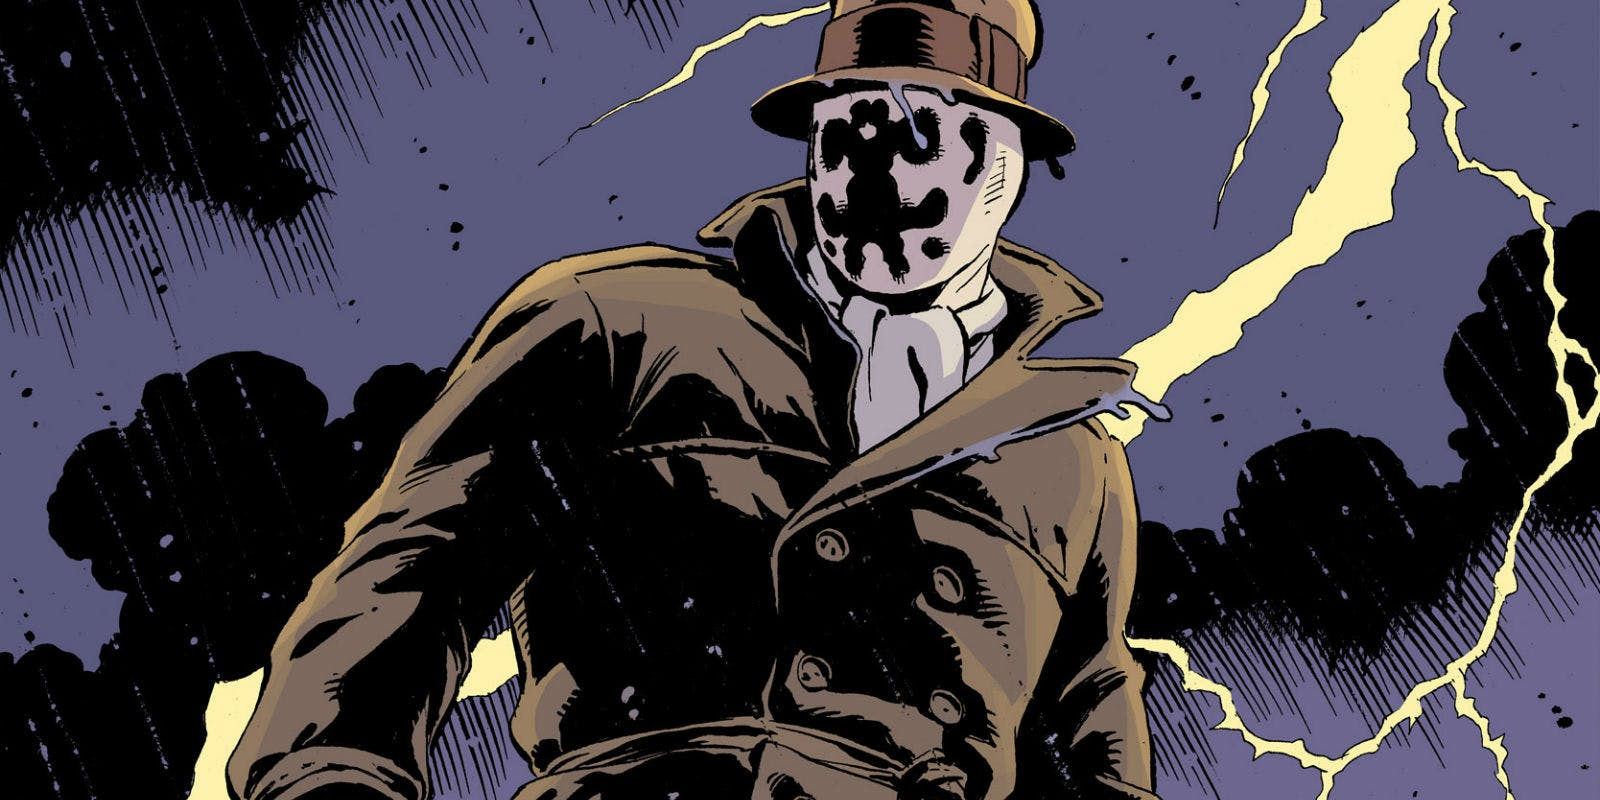 Watchmen-Rorschach-art-by-Dave-Gibbons.jpg